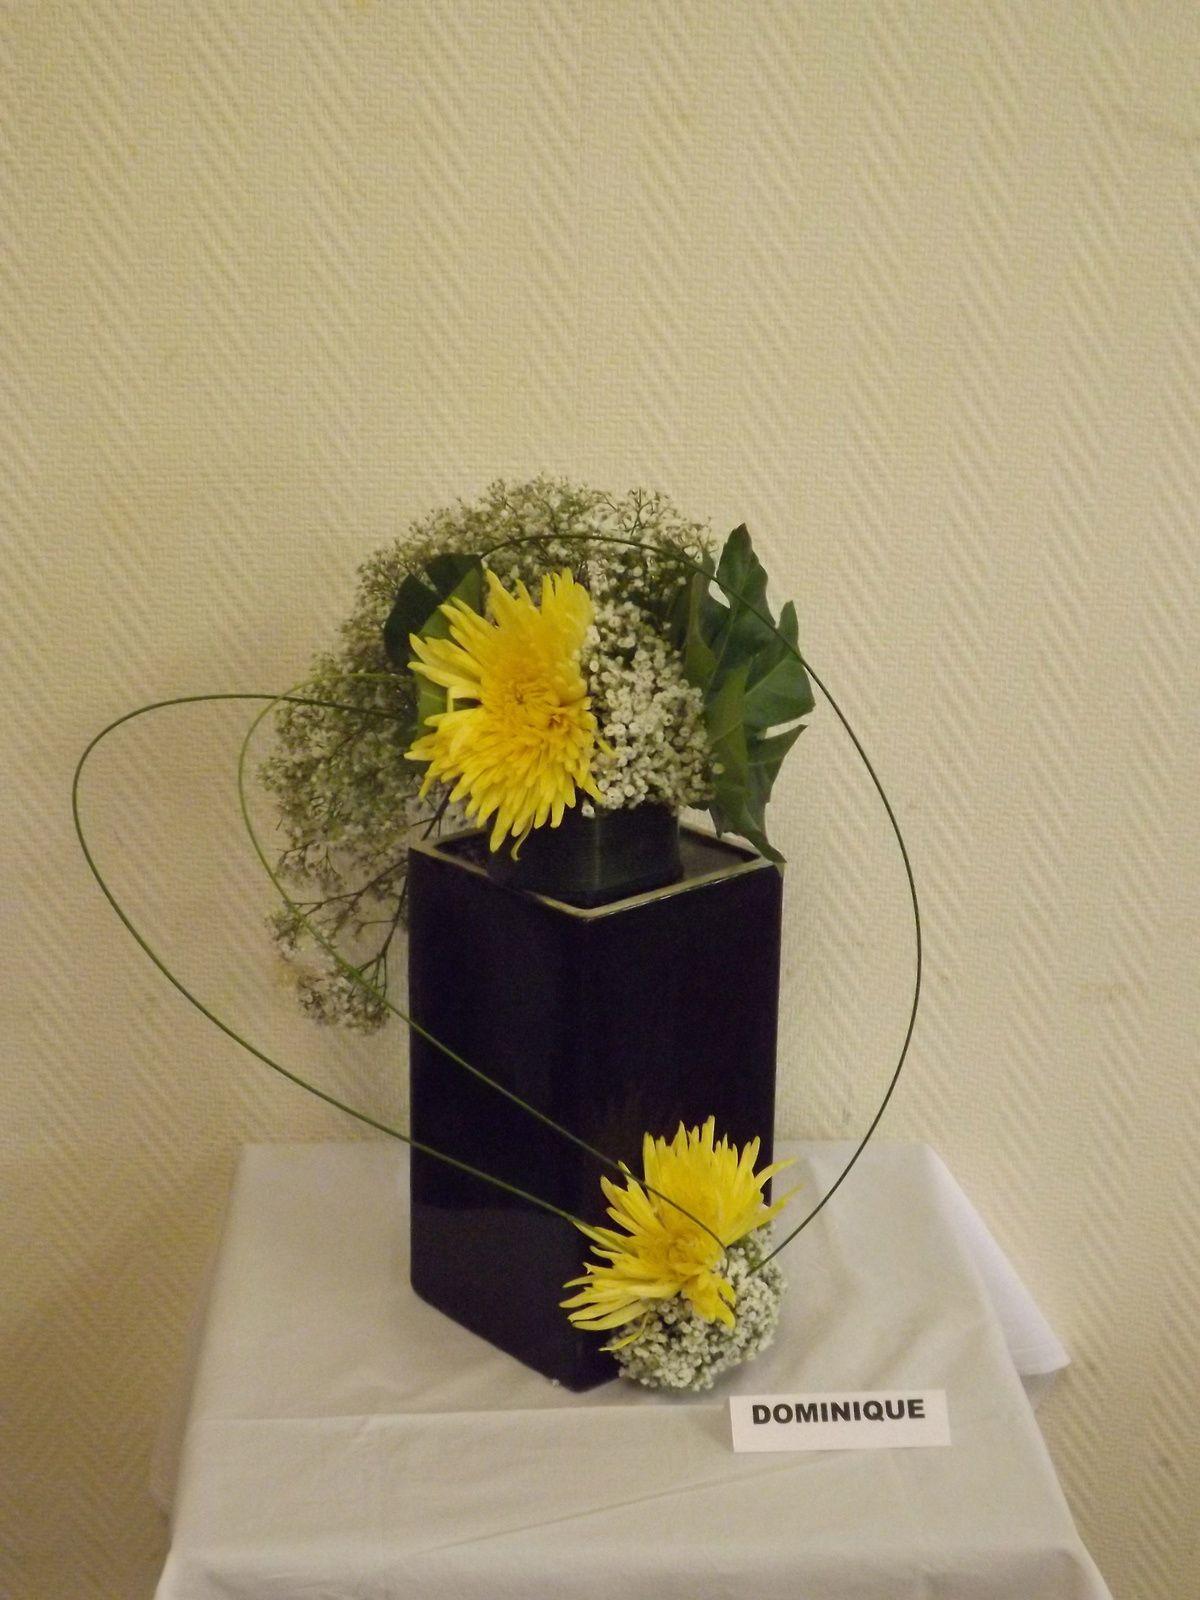 Gypsophile, Aralia, Flexi-grass, Fleurs: Crémone, Tokyo